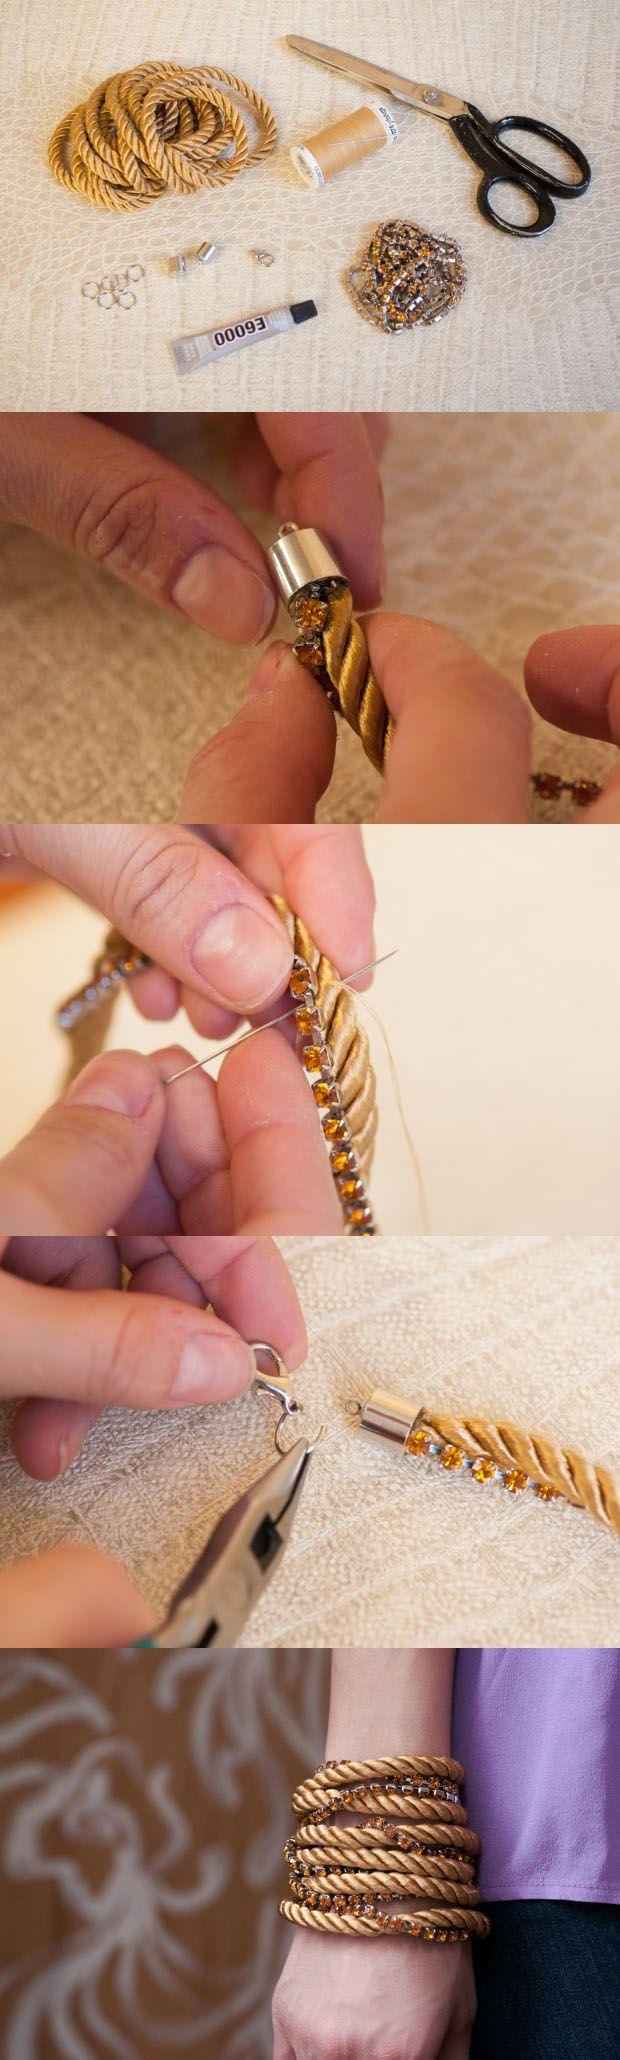 401 best accessories jewelry bracelets & cuffs images on pinterest